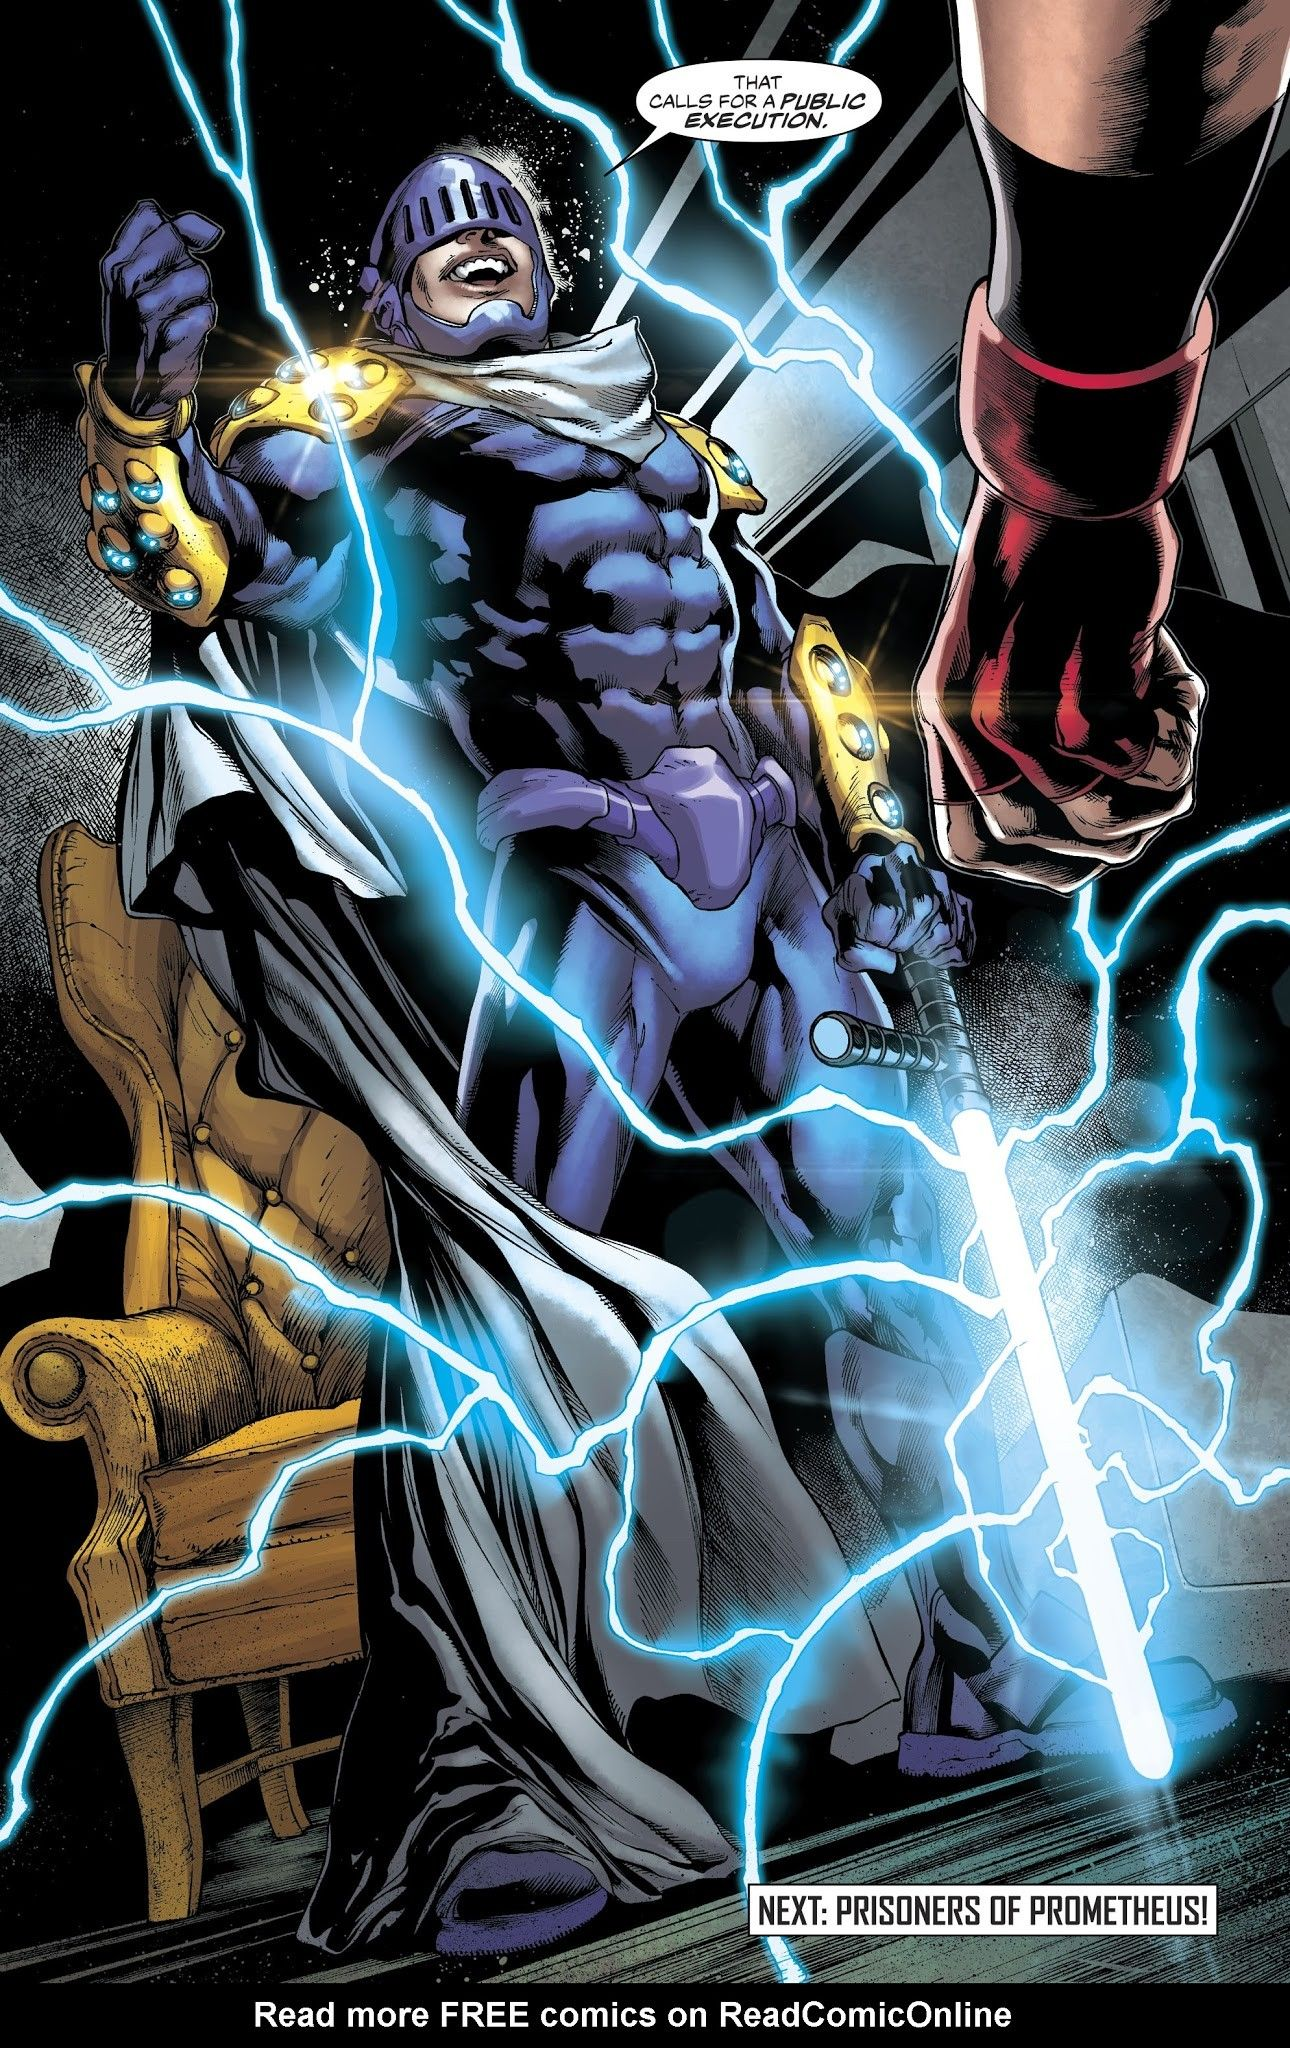 Prometheus#8 | TOP 10 | Comic character, Dc comics, Dc